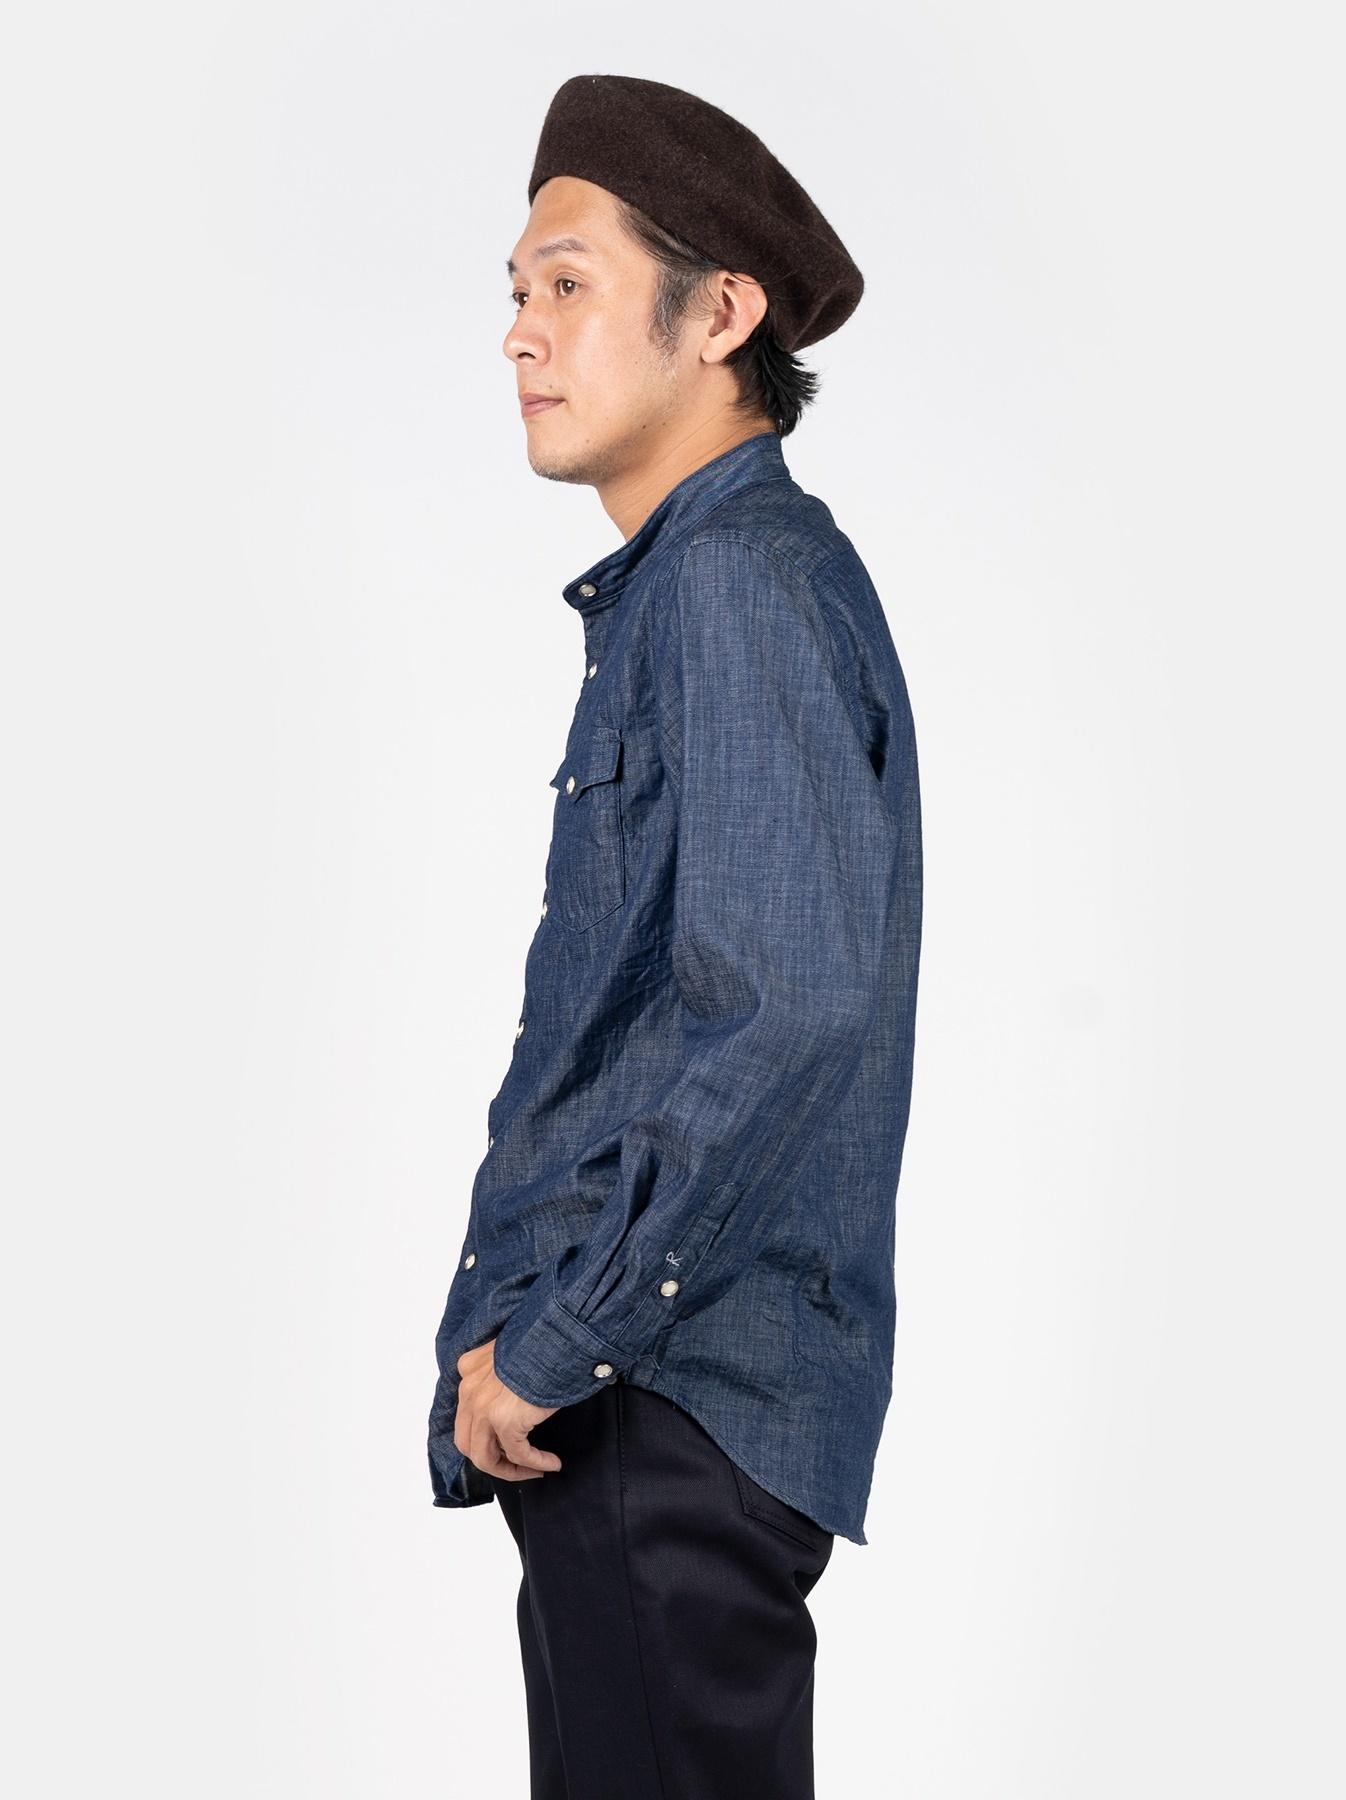 Goma Denim Stand Collar Eastern Shirt-4